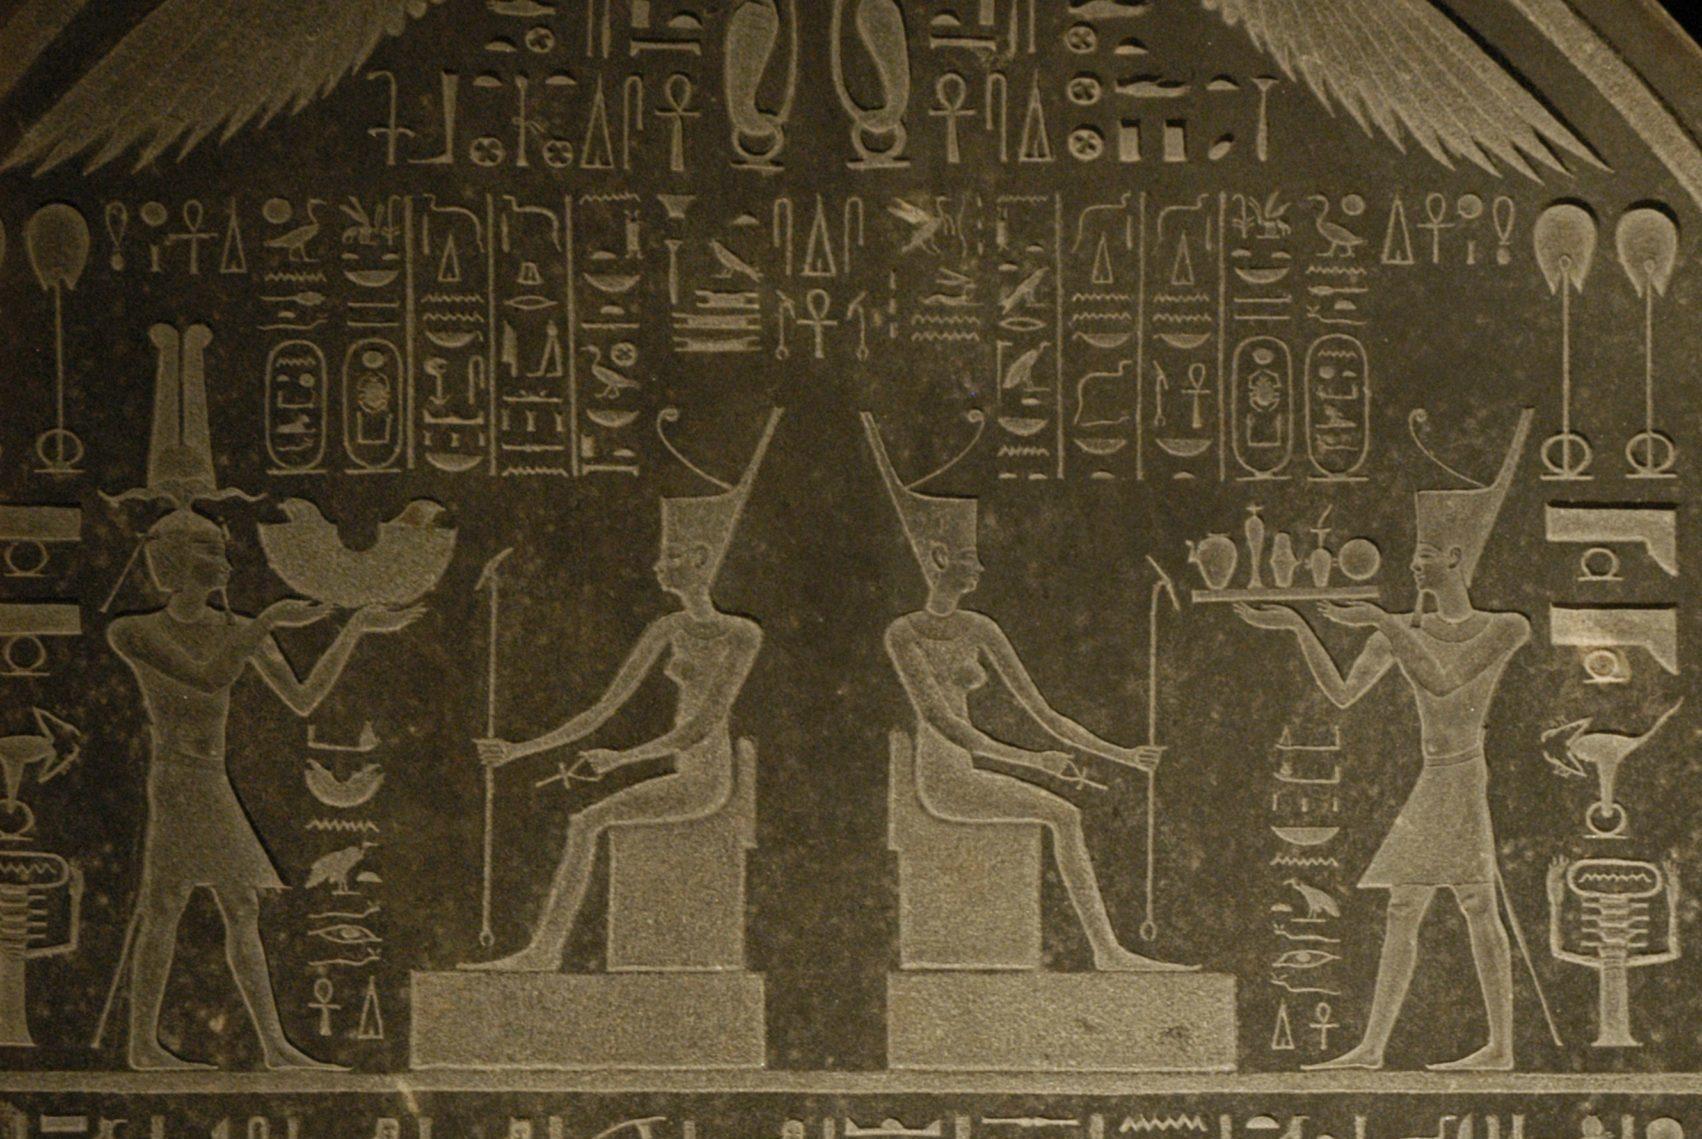 Egypt. Stele of Herakleion-Thonis. The Naucratis decree (380 B.C.) by Pharaoh Nectanebo I.